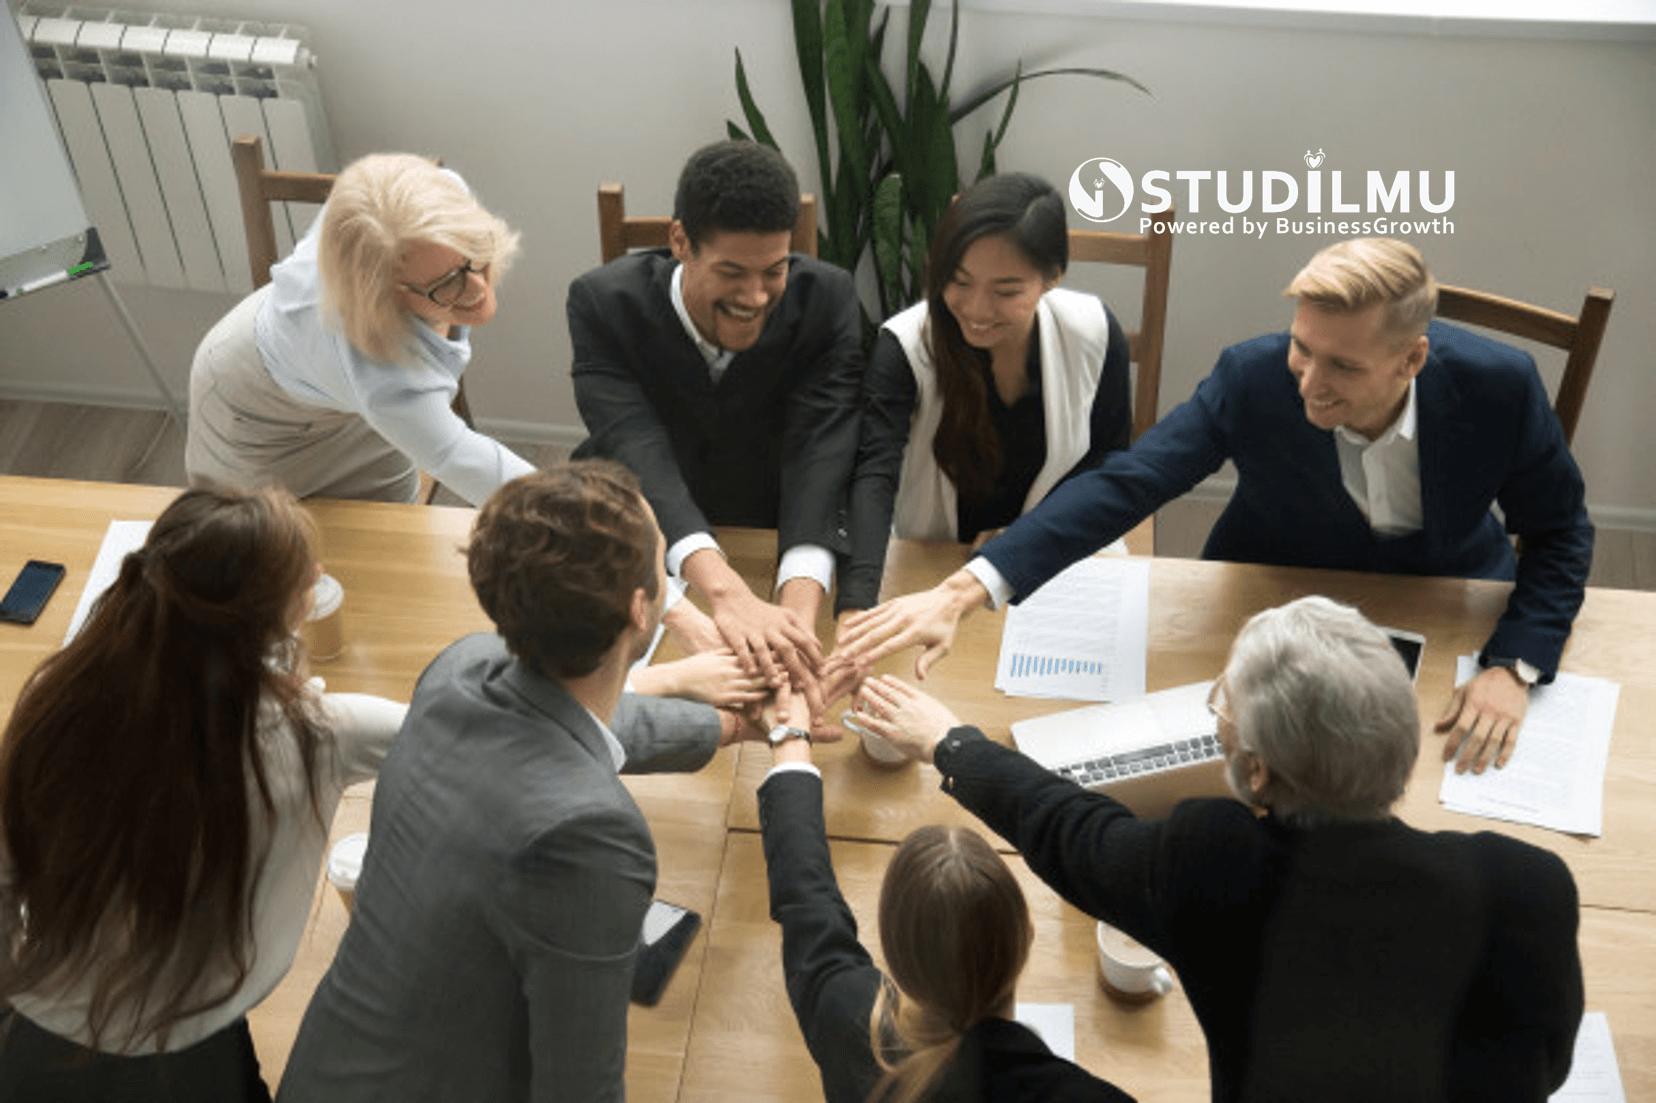 STUDILMU Career Advice - 5 Pertanyaan yang Mendorong Semangat Kerja Karyawan